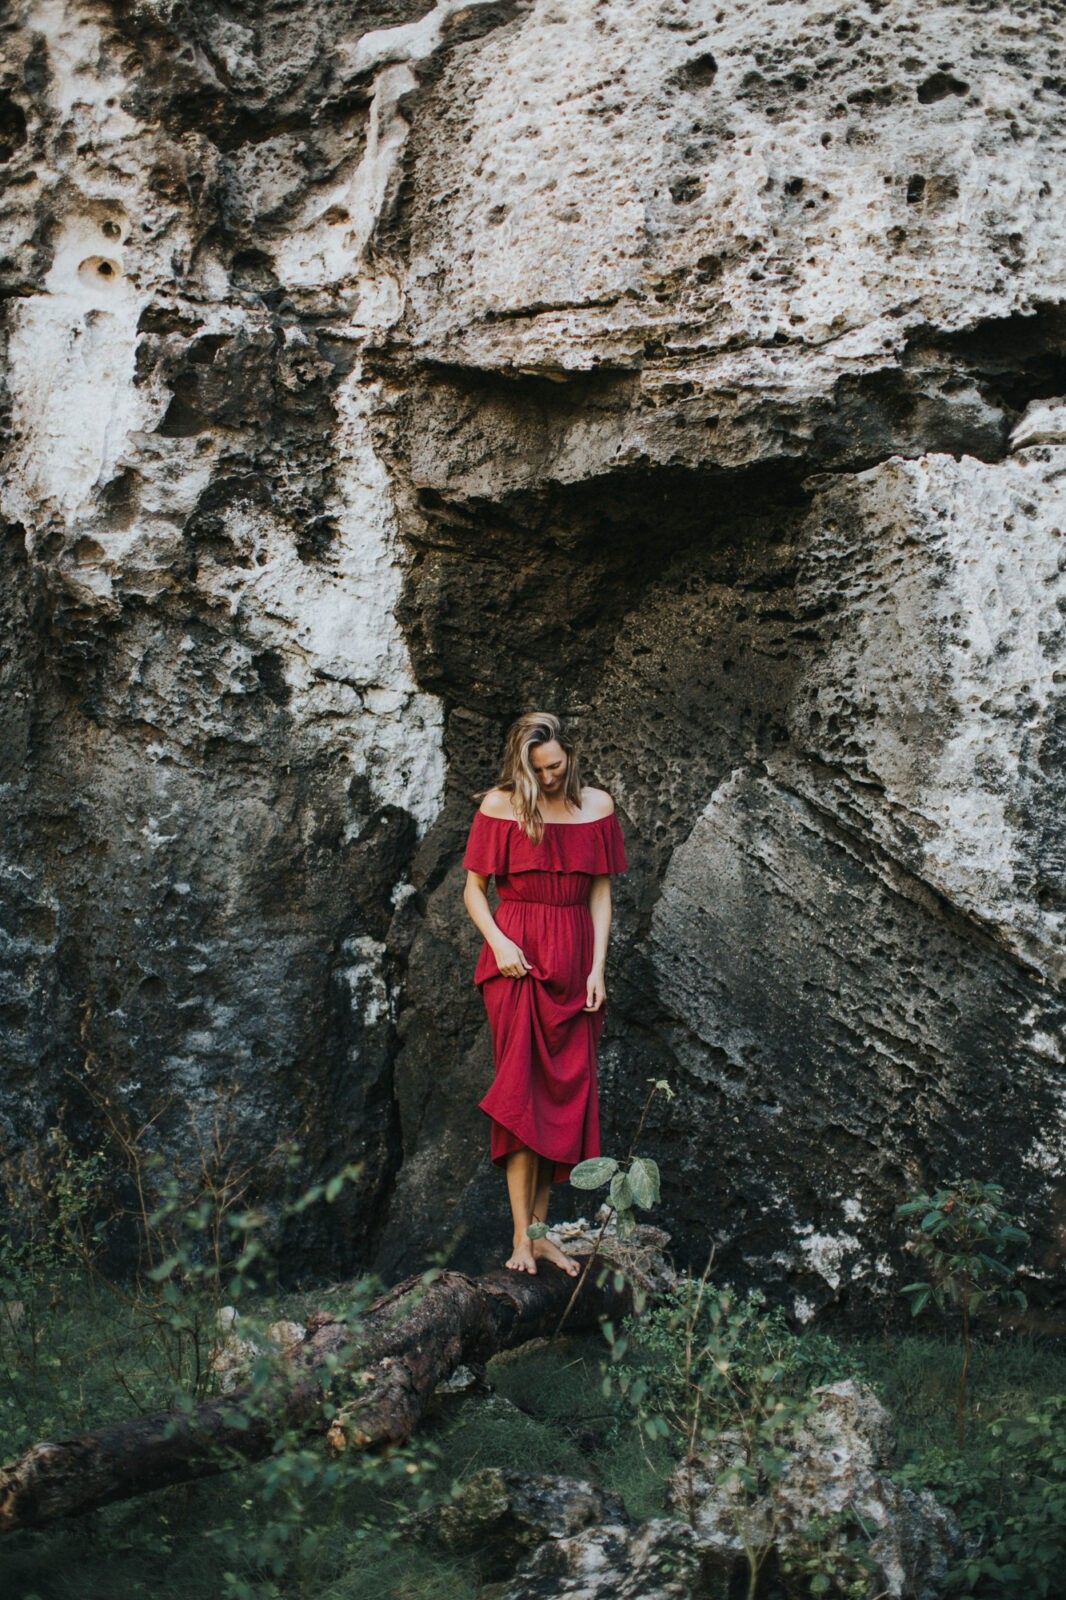 preachers cave eleuthera bahamas